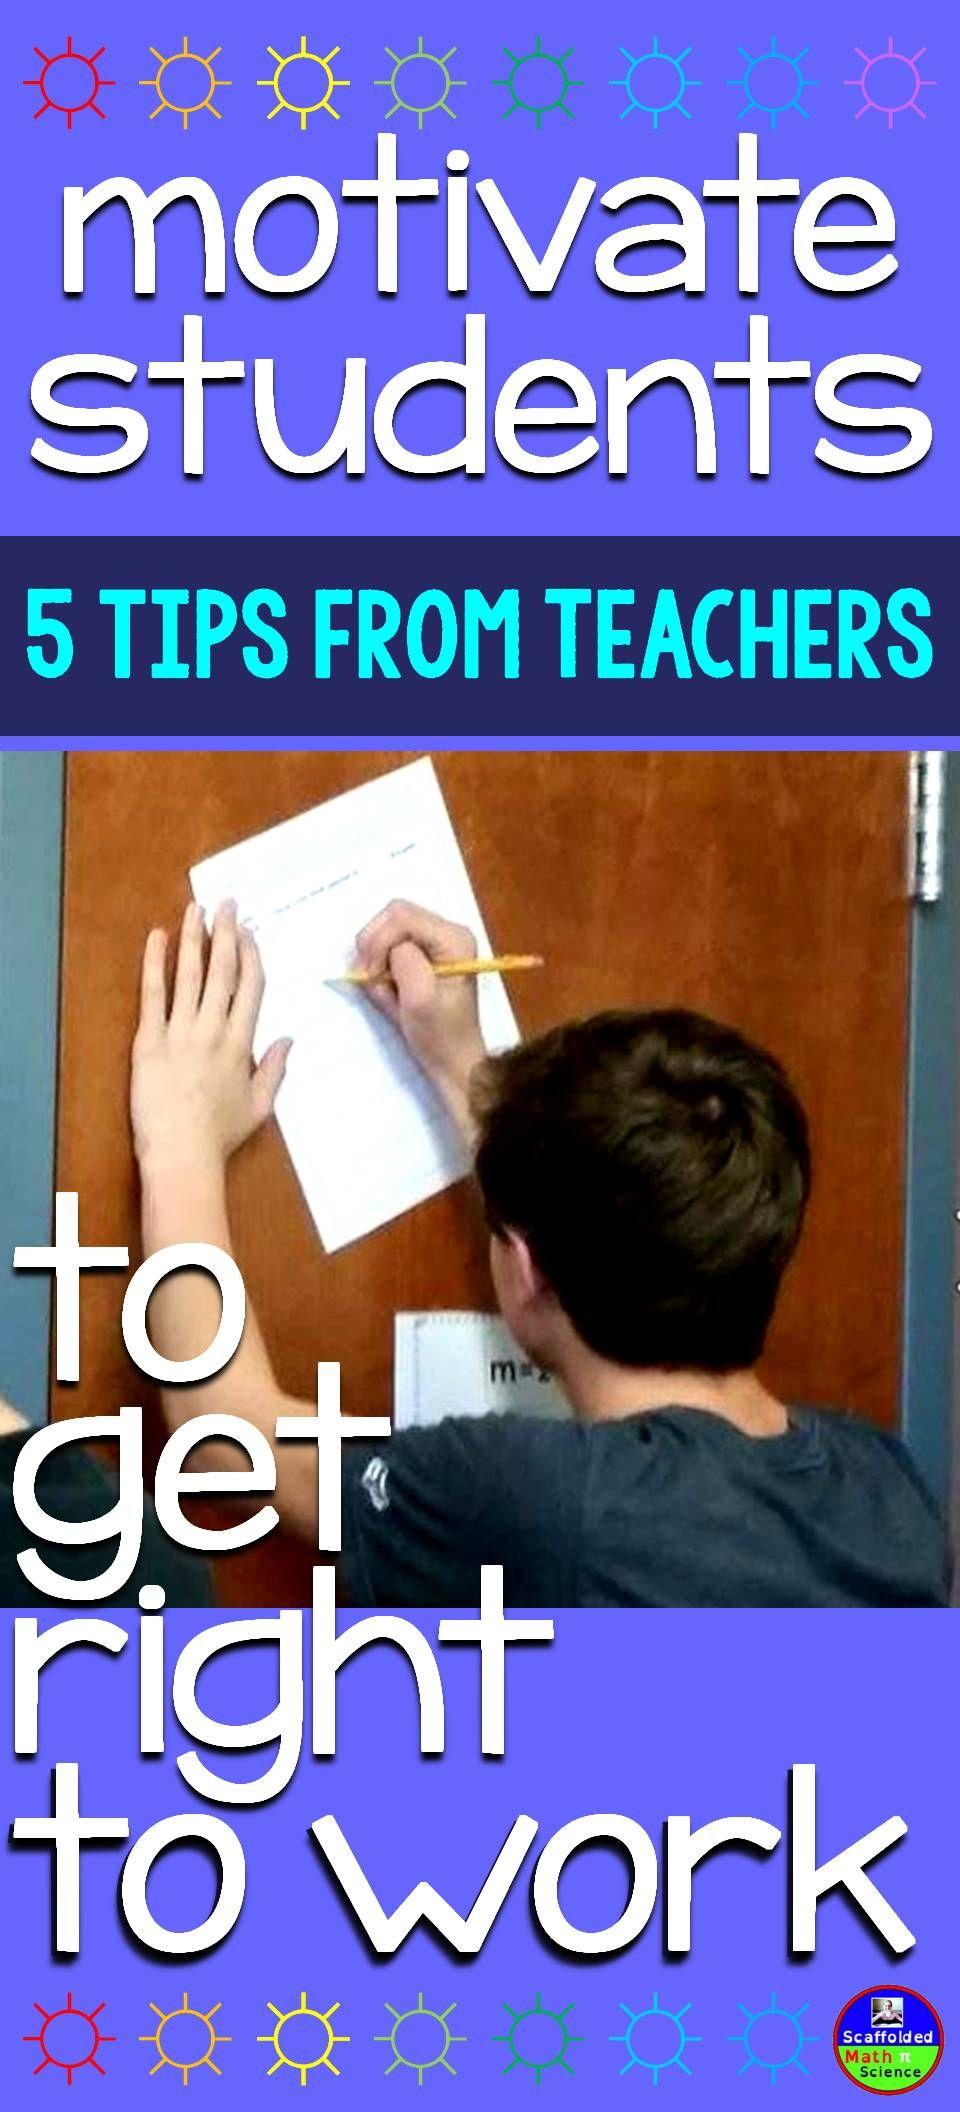 5 Ways to Get Students to SelfStart Student motivation